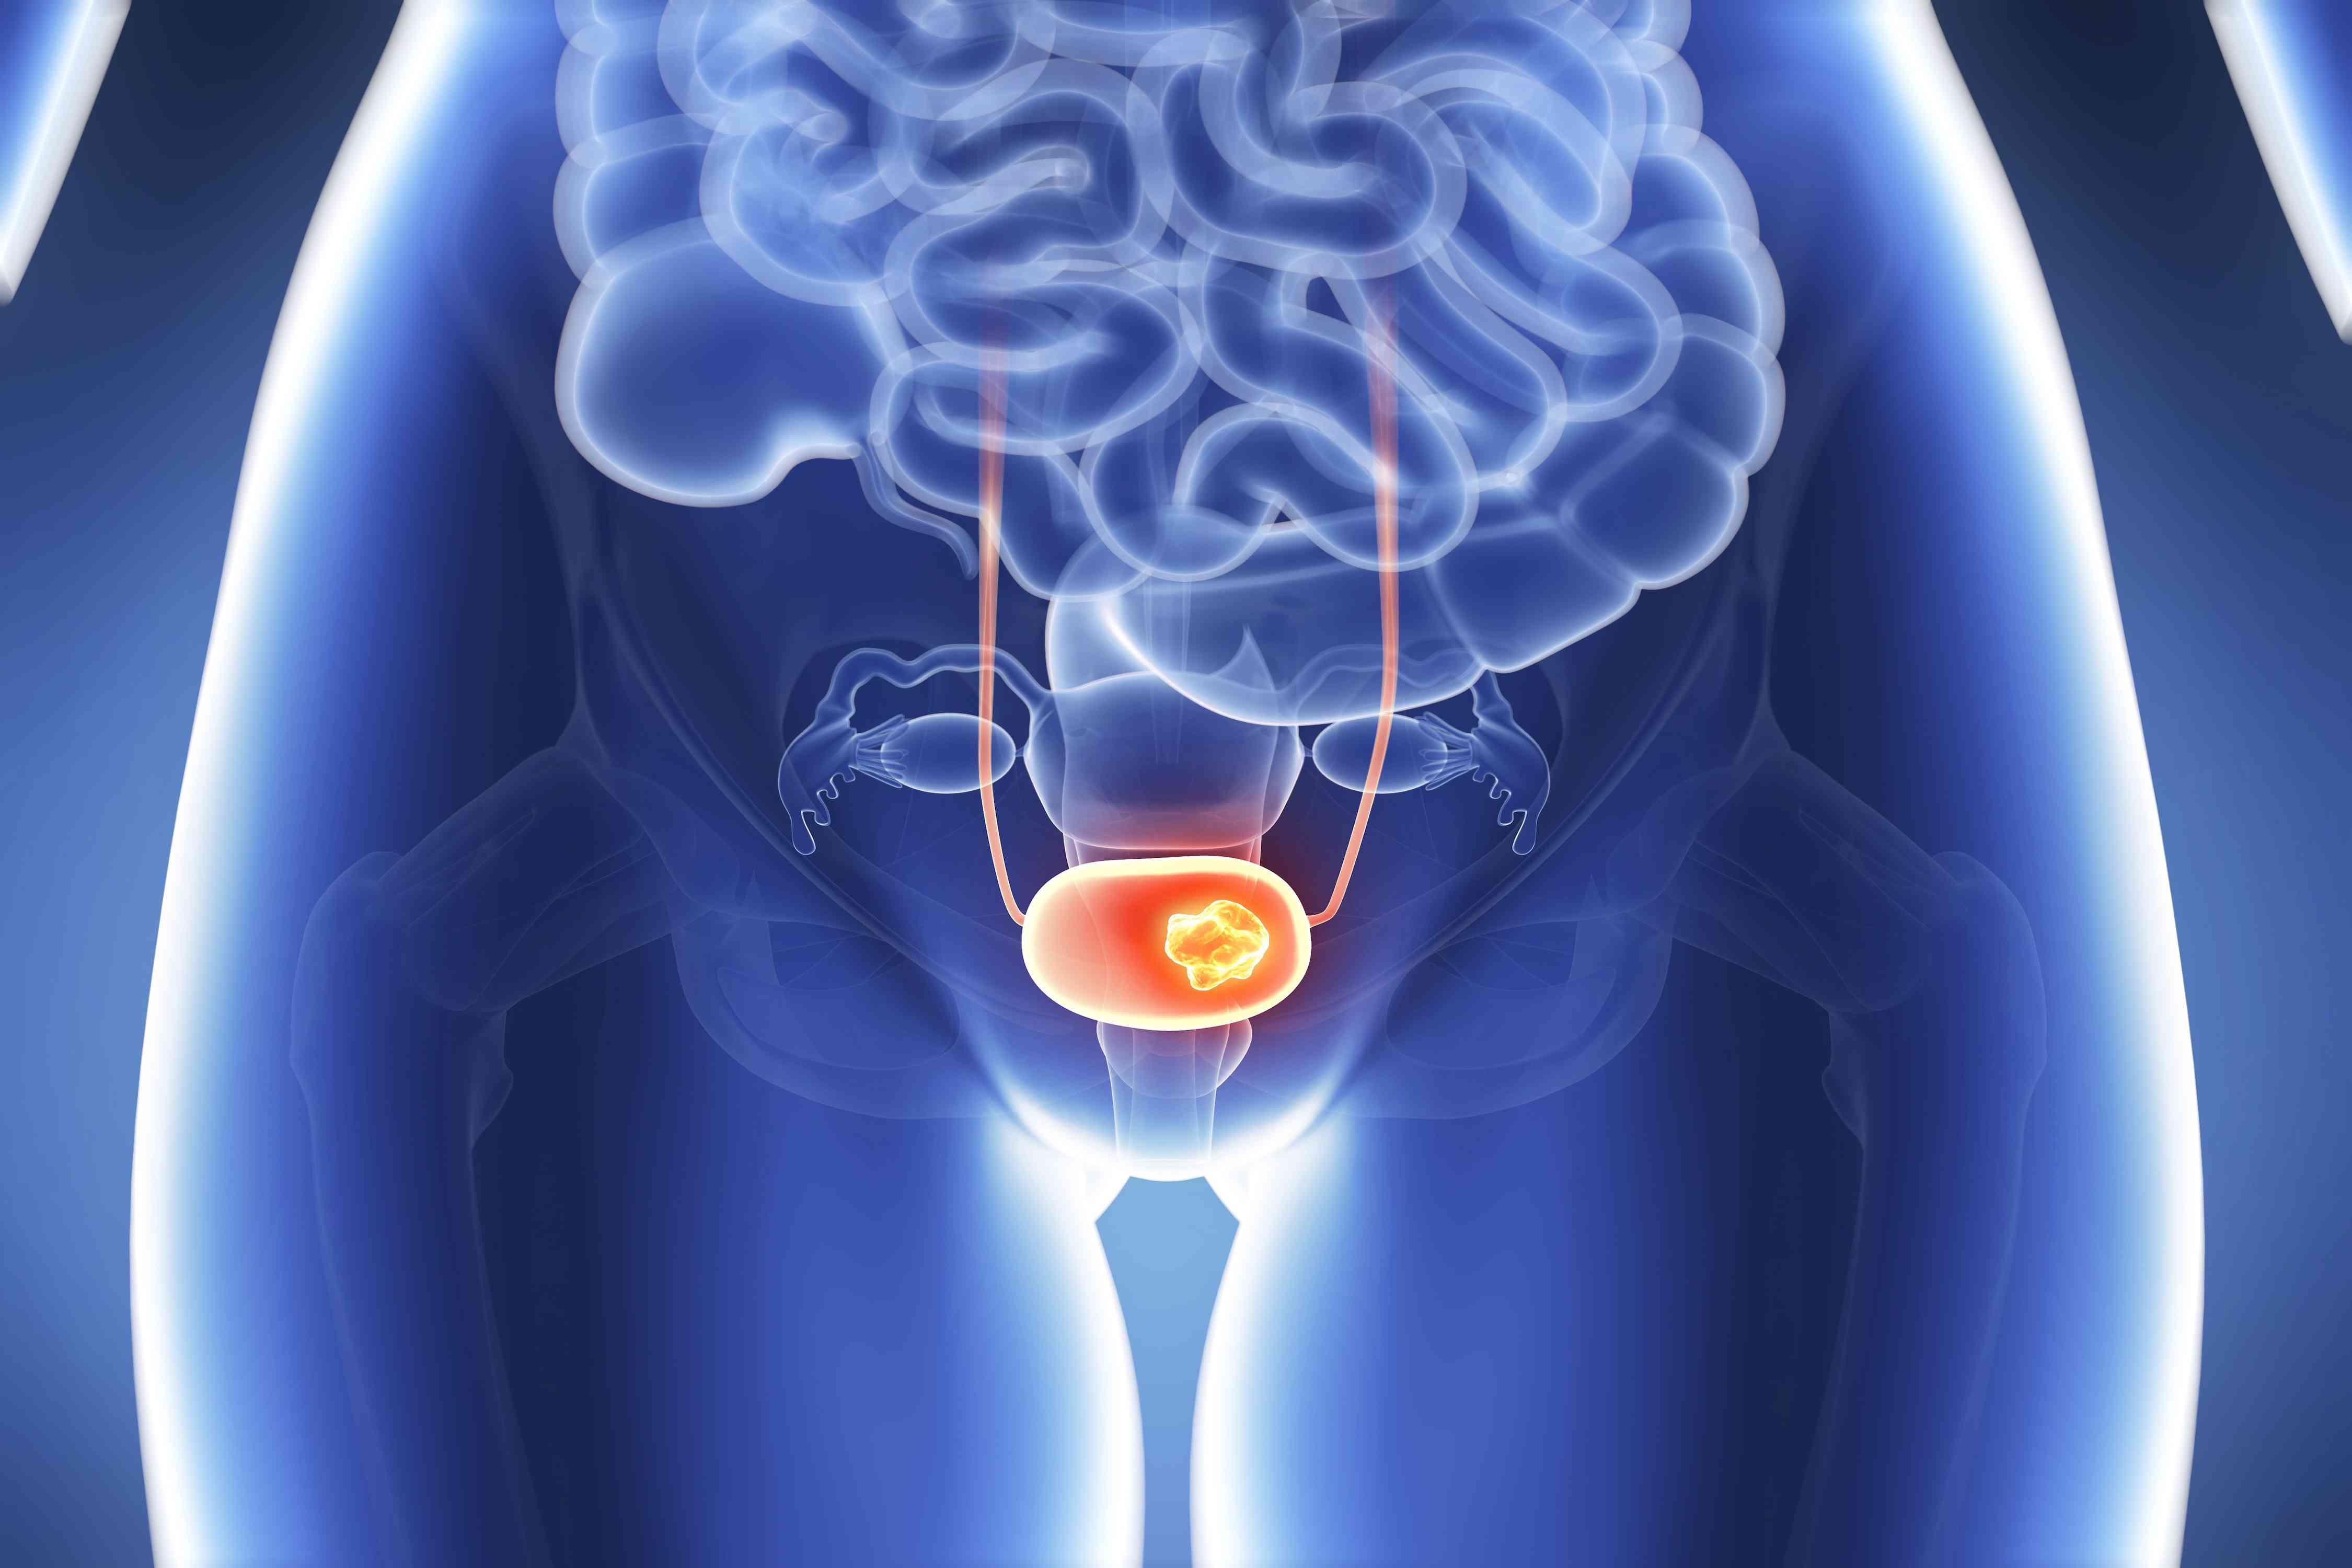 Bladder cancer shown inside a woman's lower pelvis